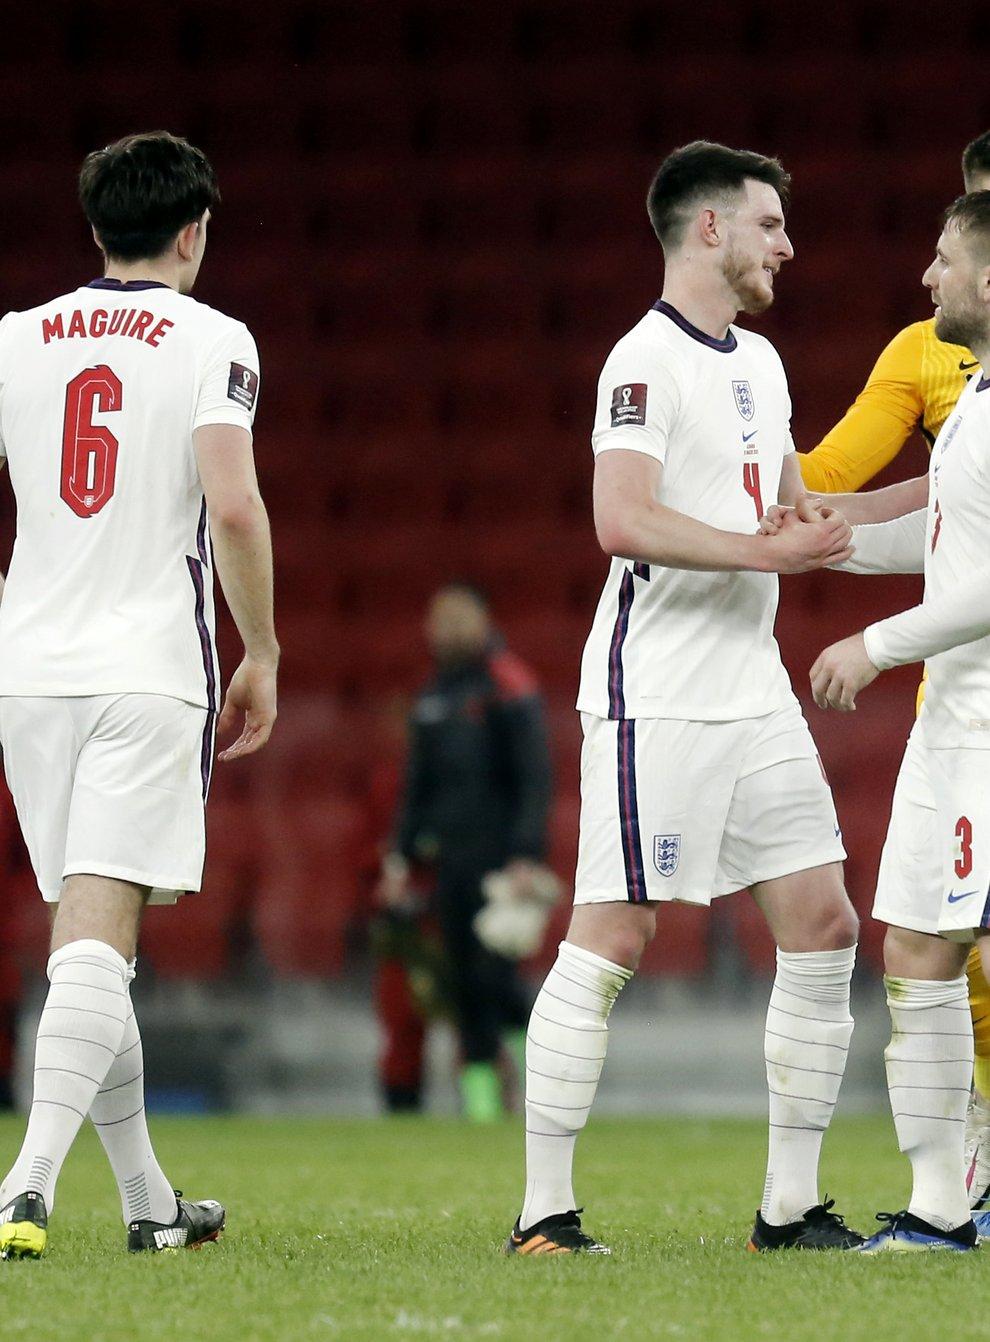 Luke Shaw (3) was back in the England fold on Sunday